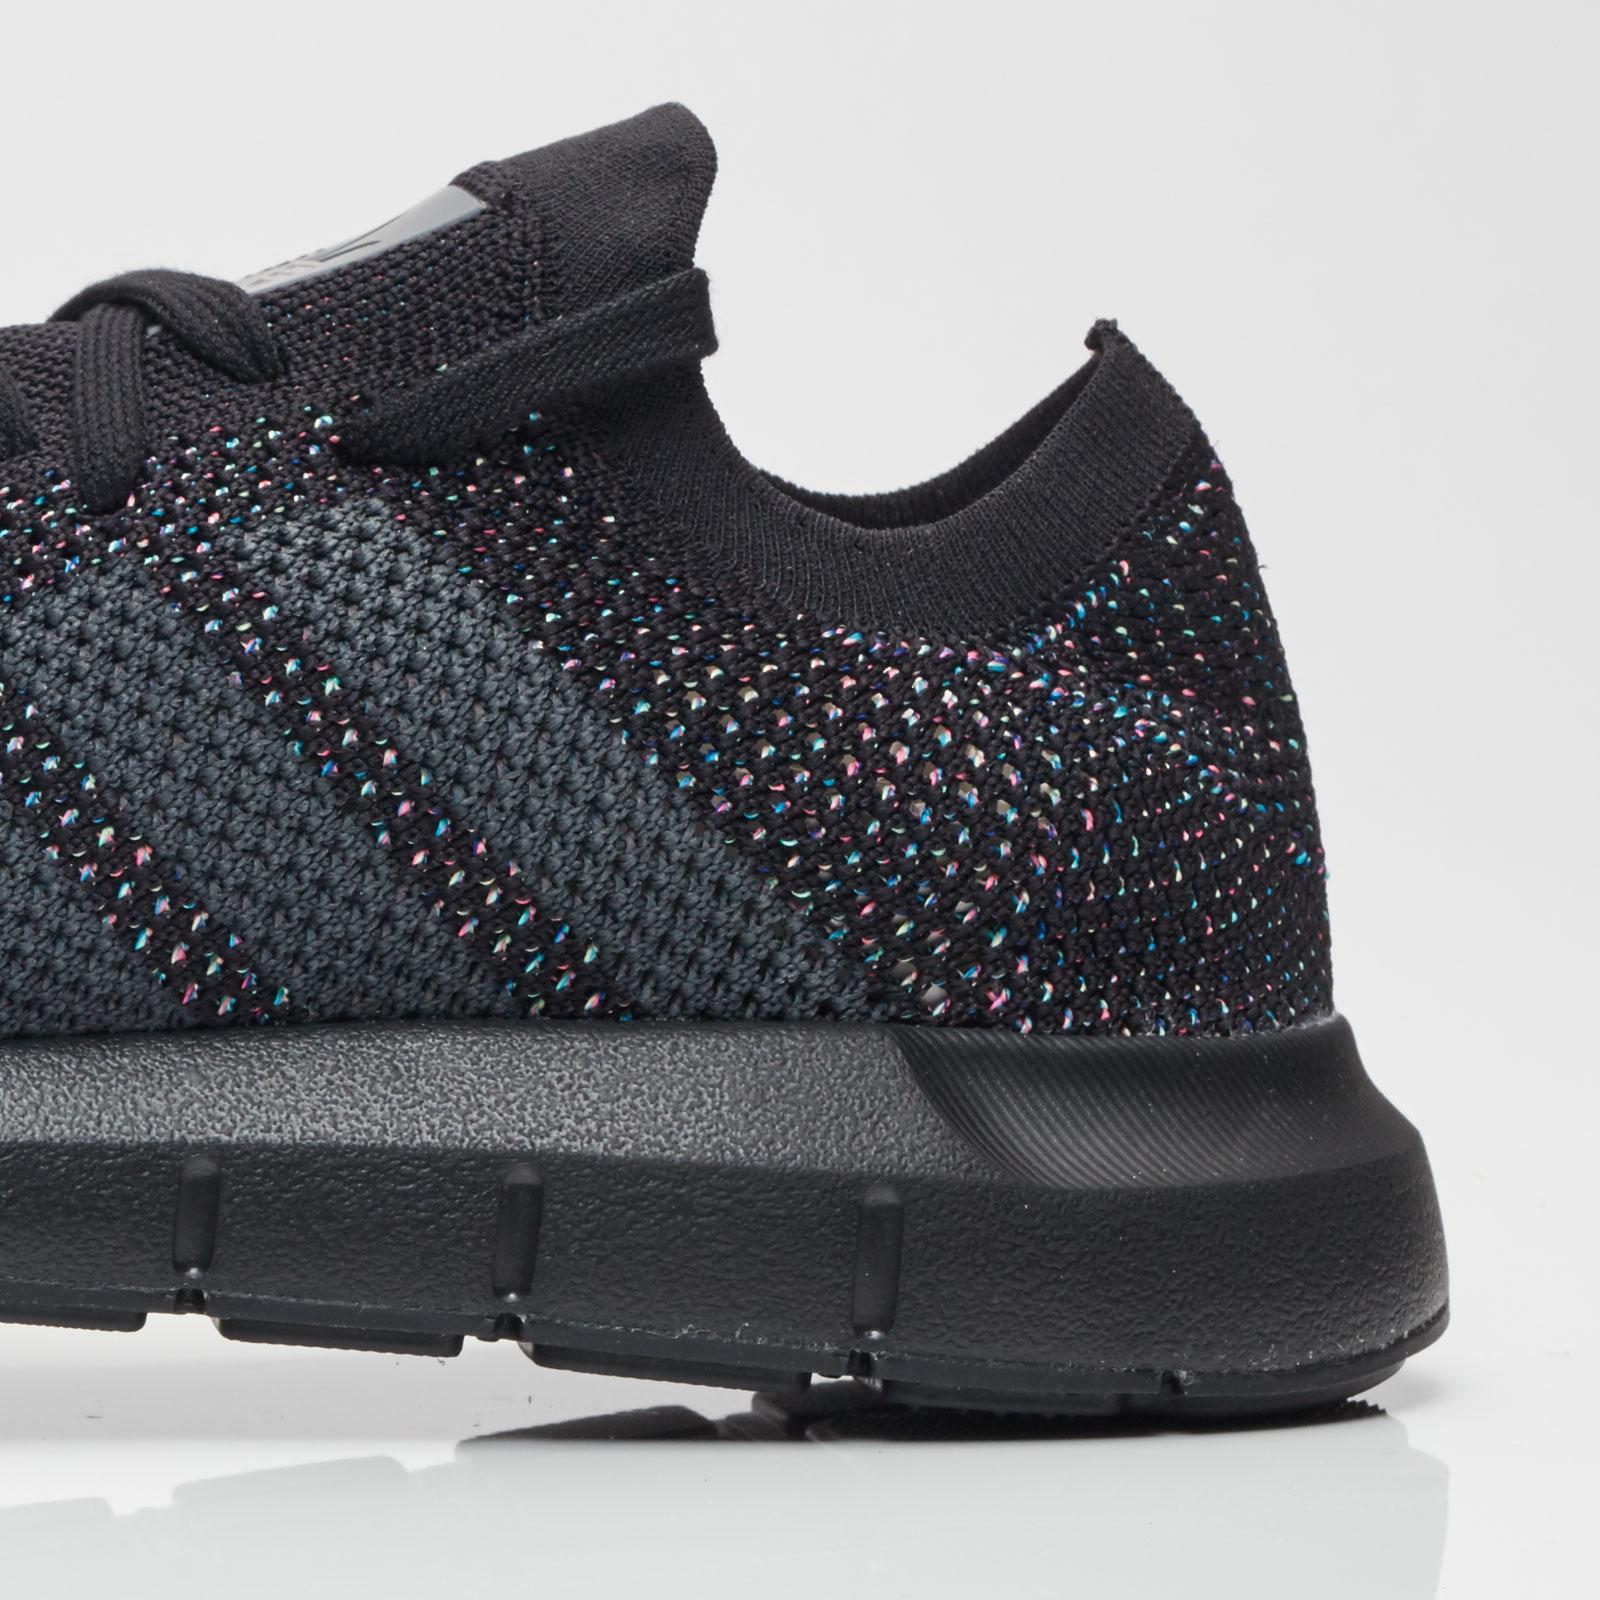 29fc5e4eb63d adidas Swift Run PK - Cg4127 - Sneakersnstuff